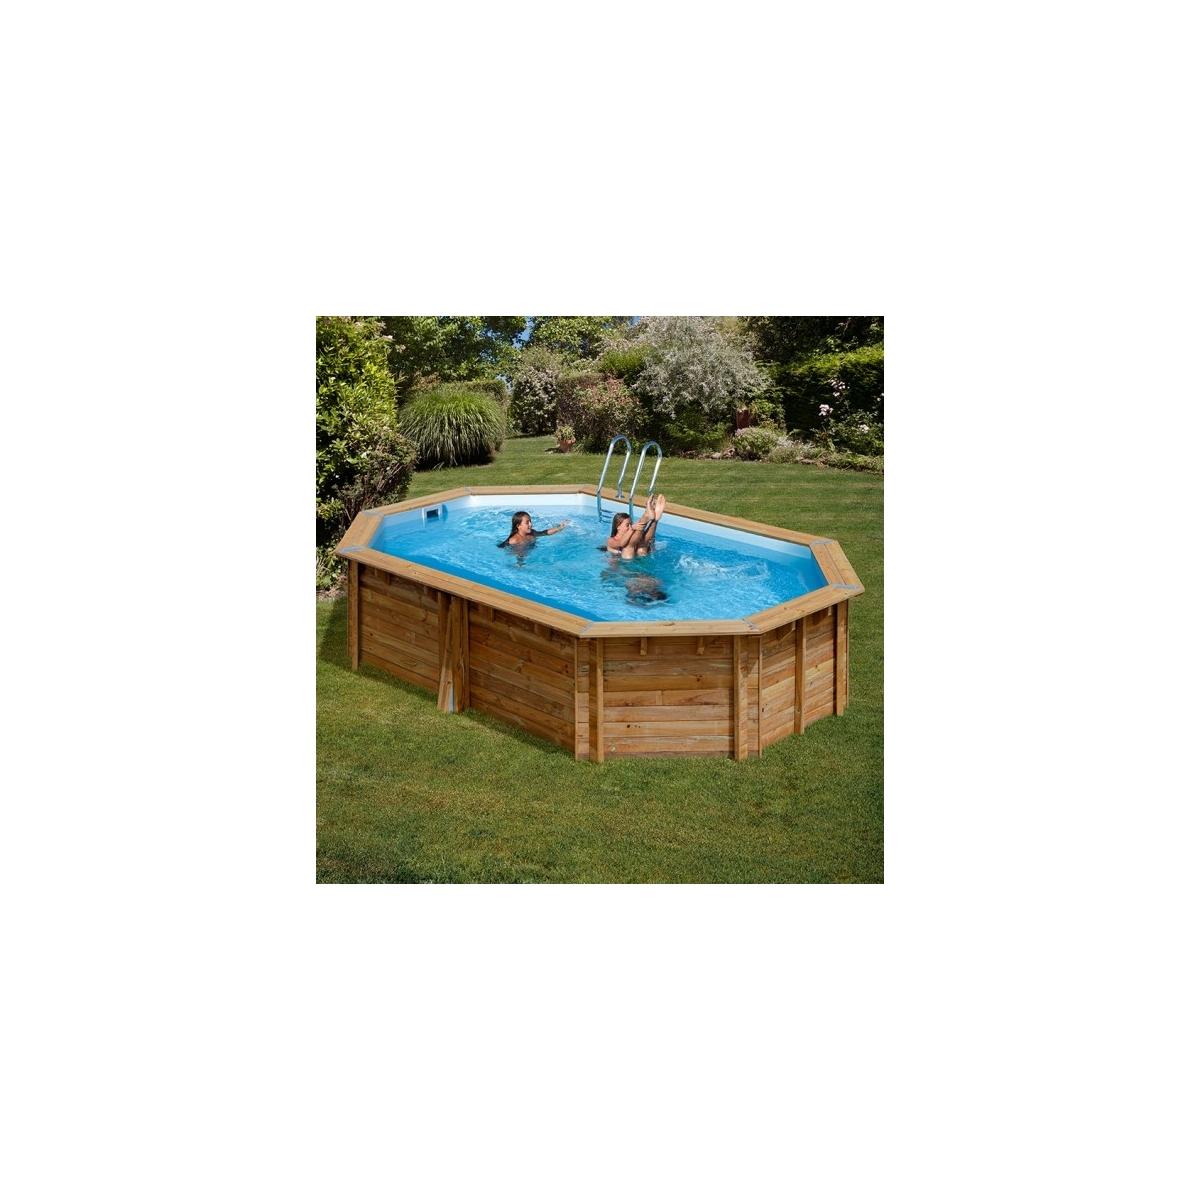 Piscina desmontable de madera Gre Sunbay Cannelle ovalada 551x351x119